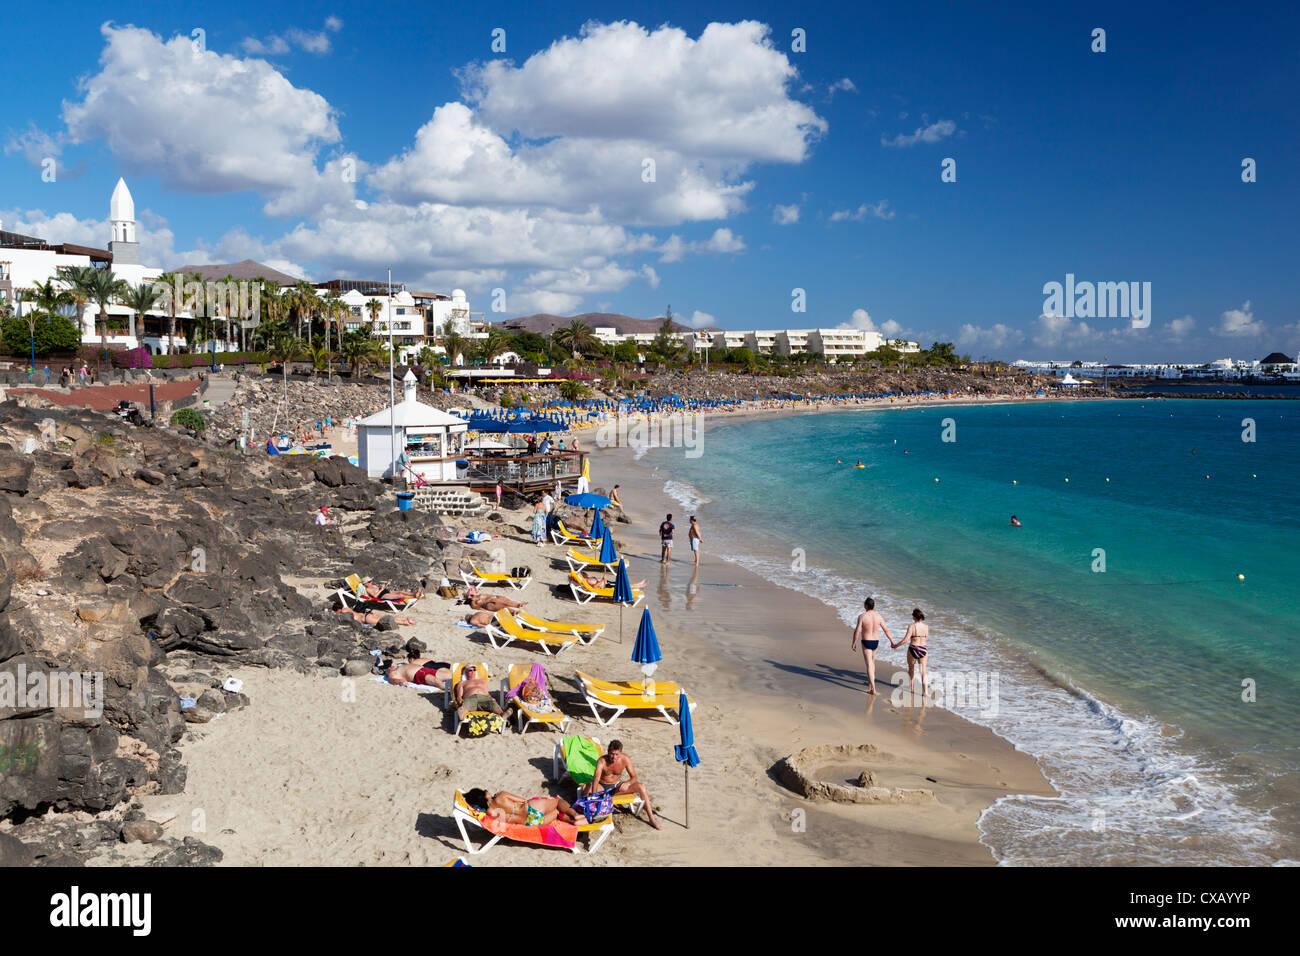 Beach view, Playa Blanca, Lanzarote, Canary Islands, Spain, Atlantic, Europe - Stock Image